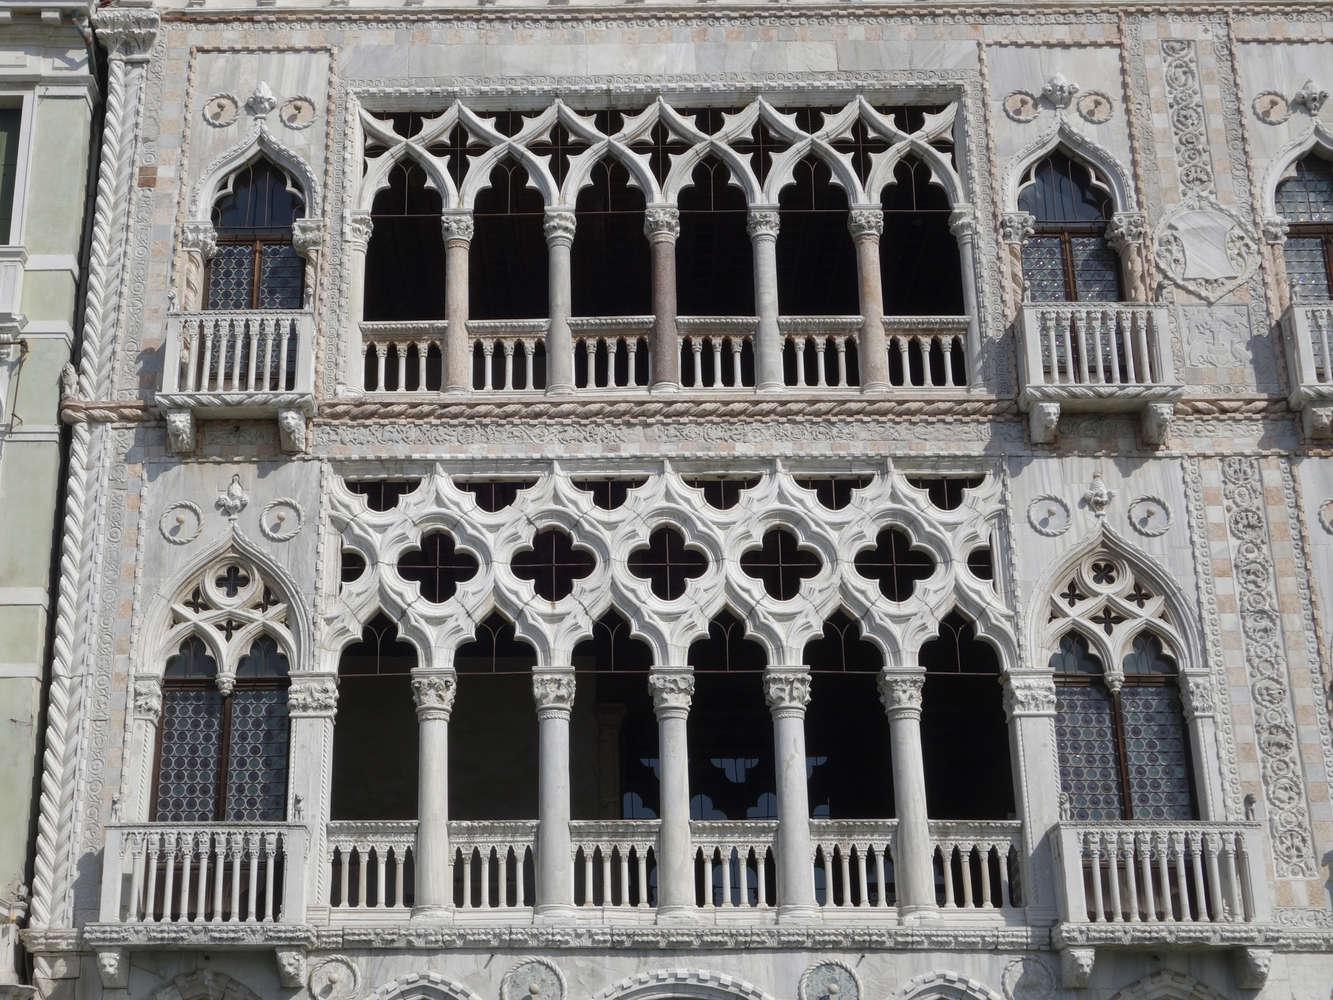 Benátky, Ca' d'Oro